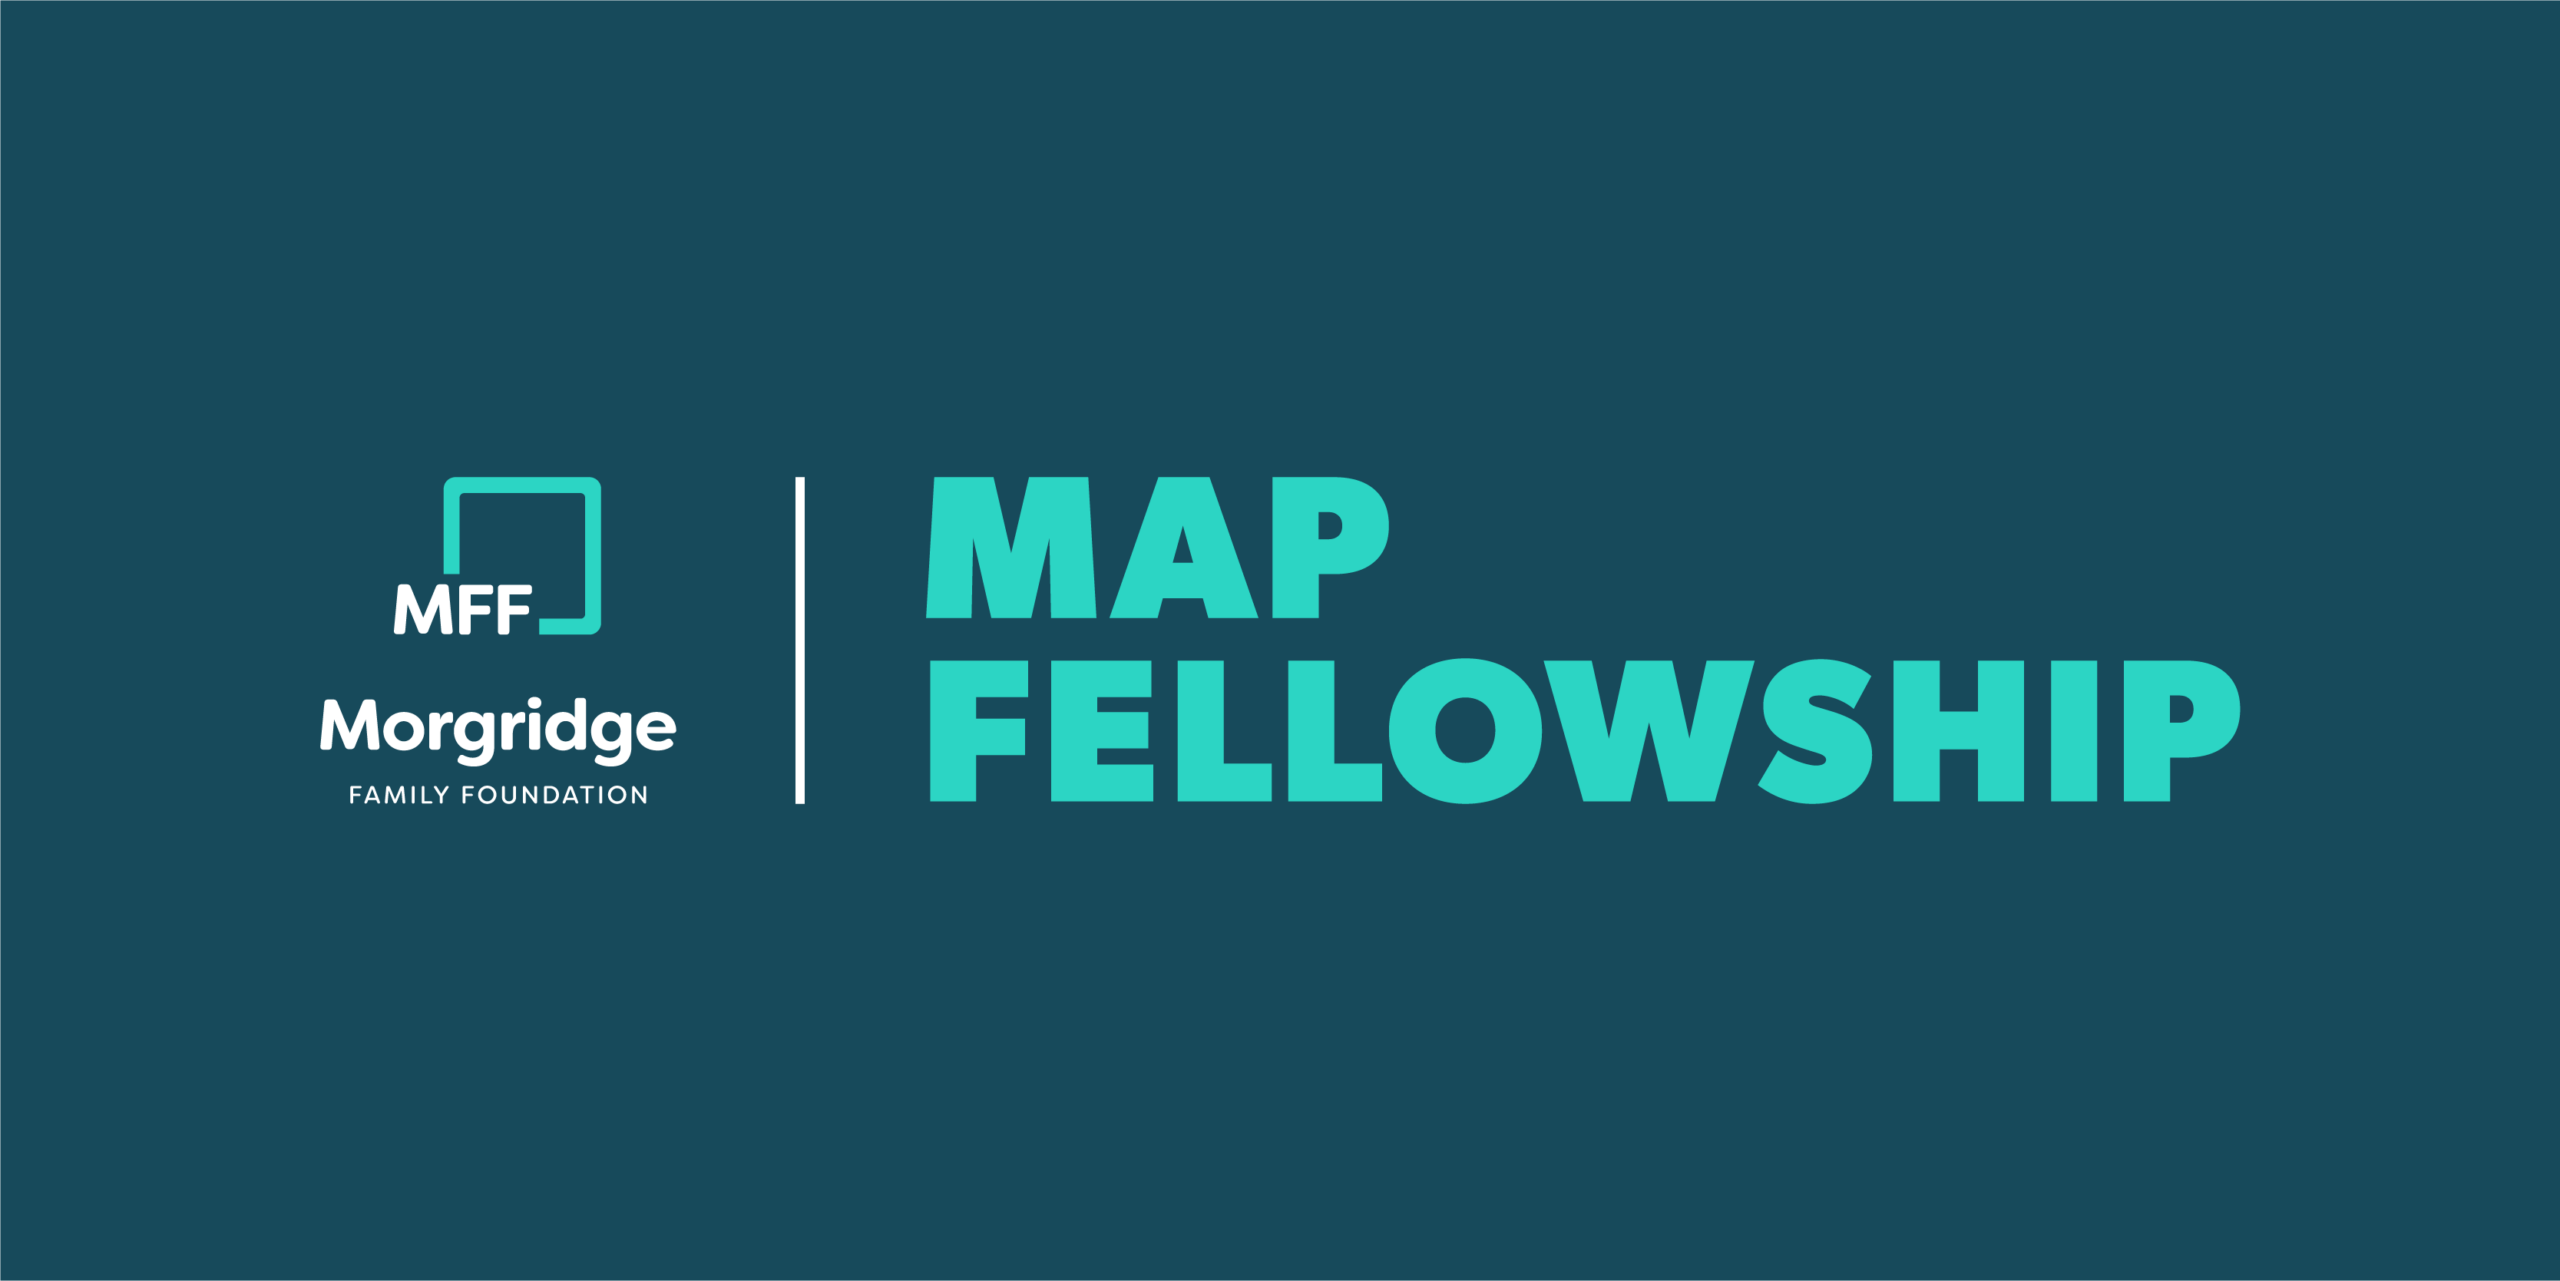 MAP Fellowship by the Morgridge Family Foundatio